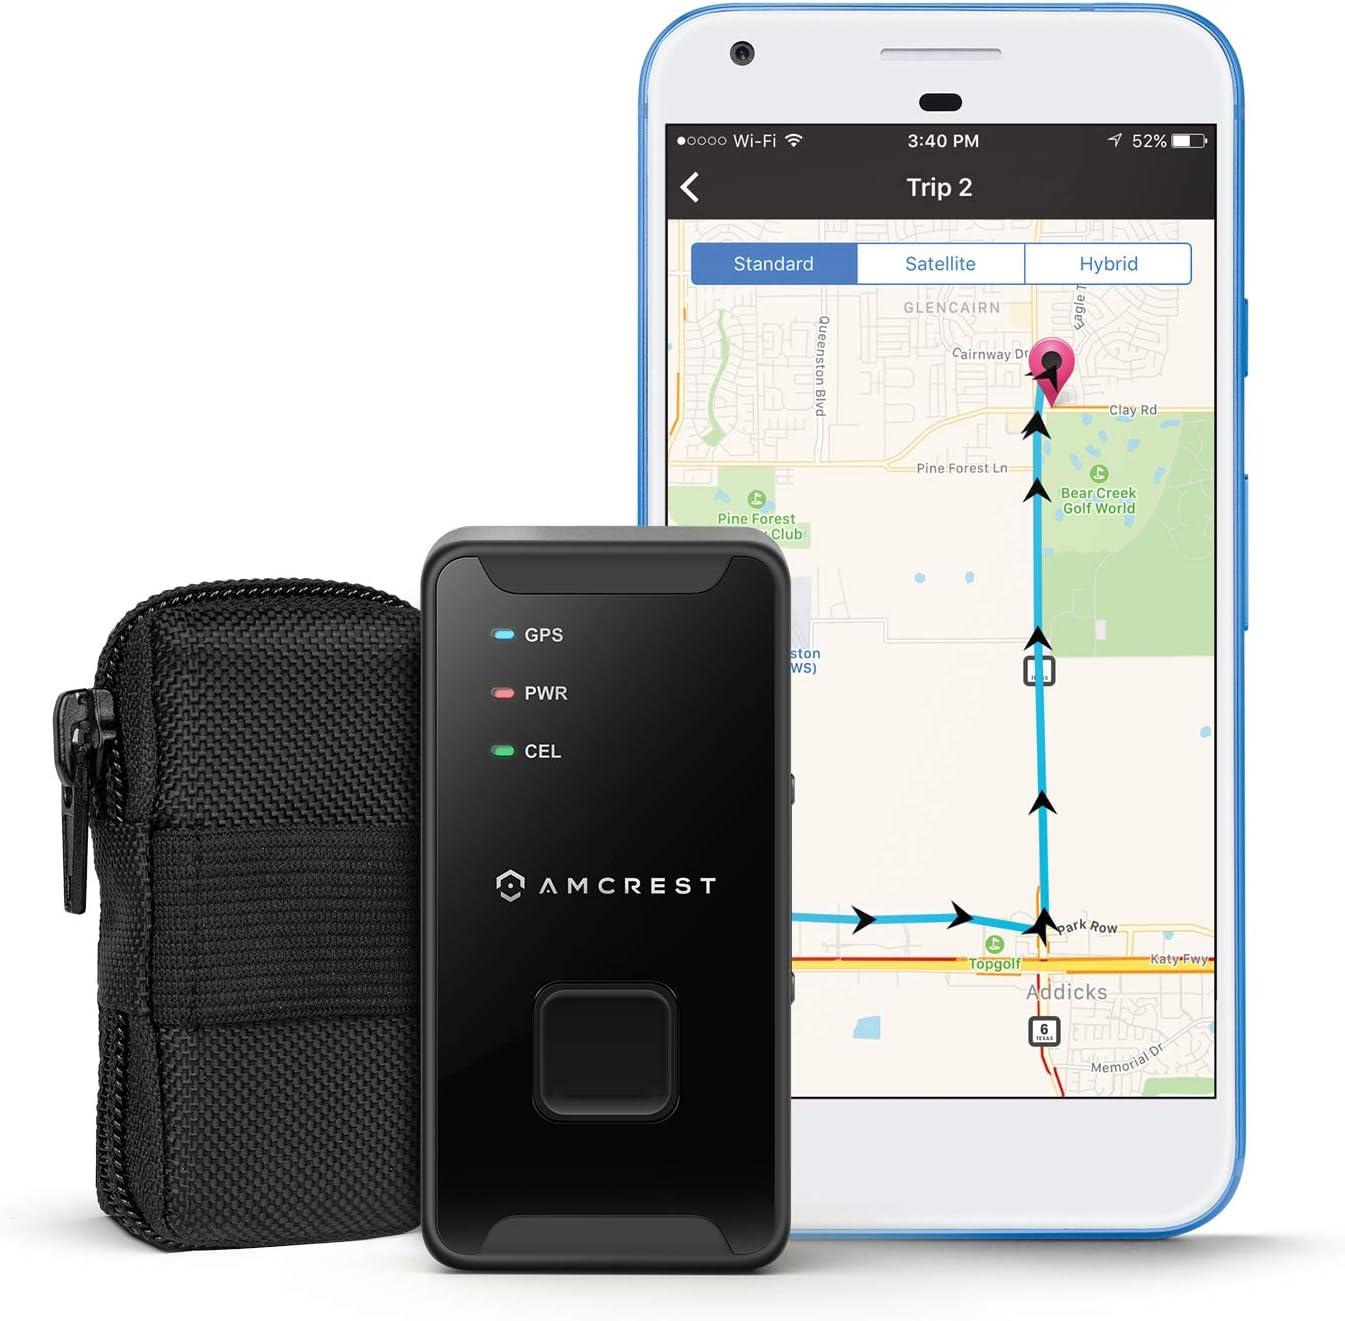 Amcrest GPS Tracker for Vehicles